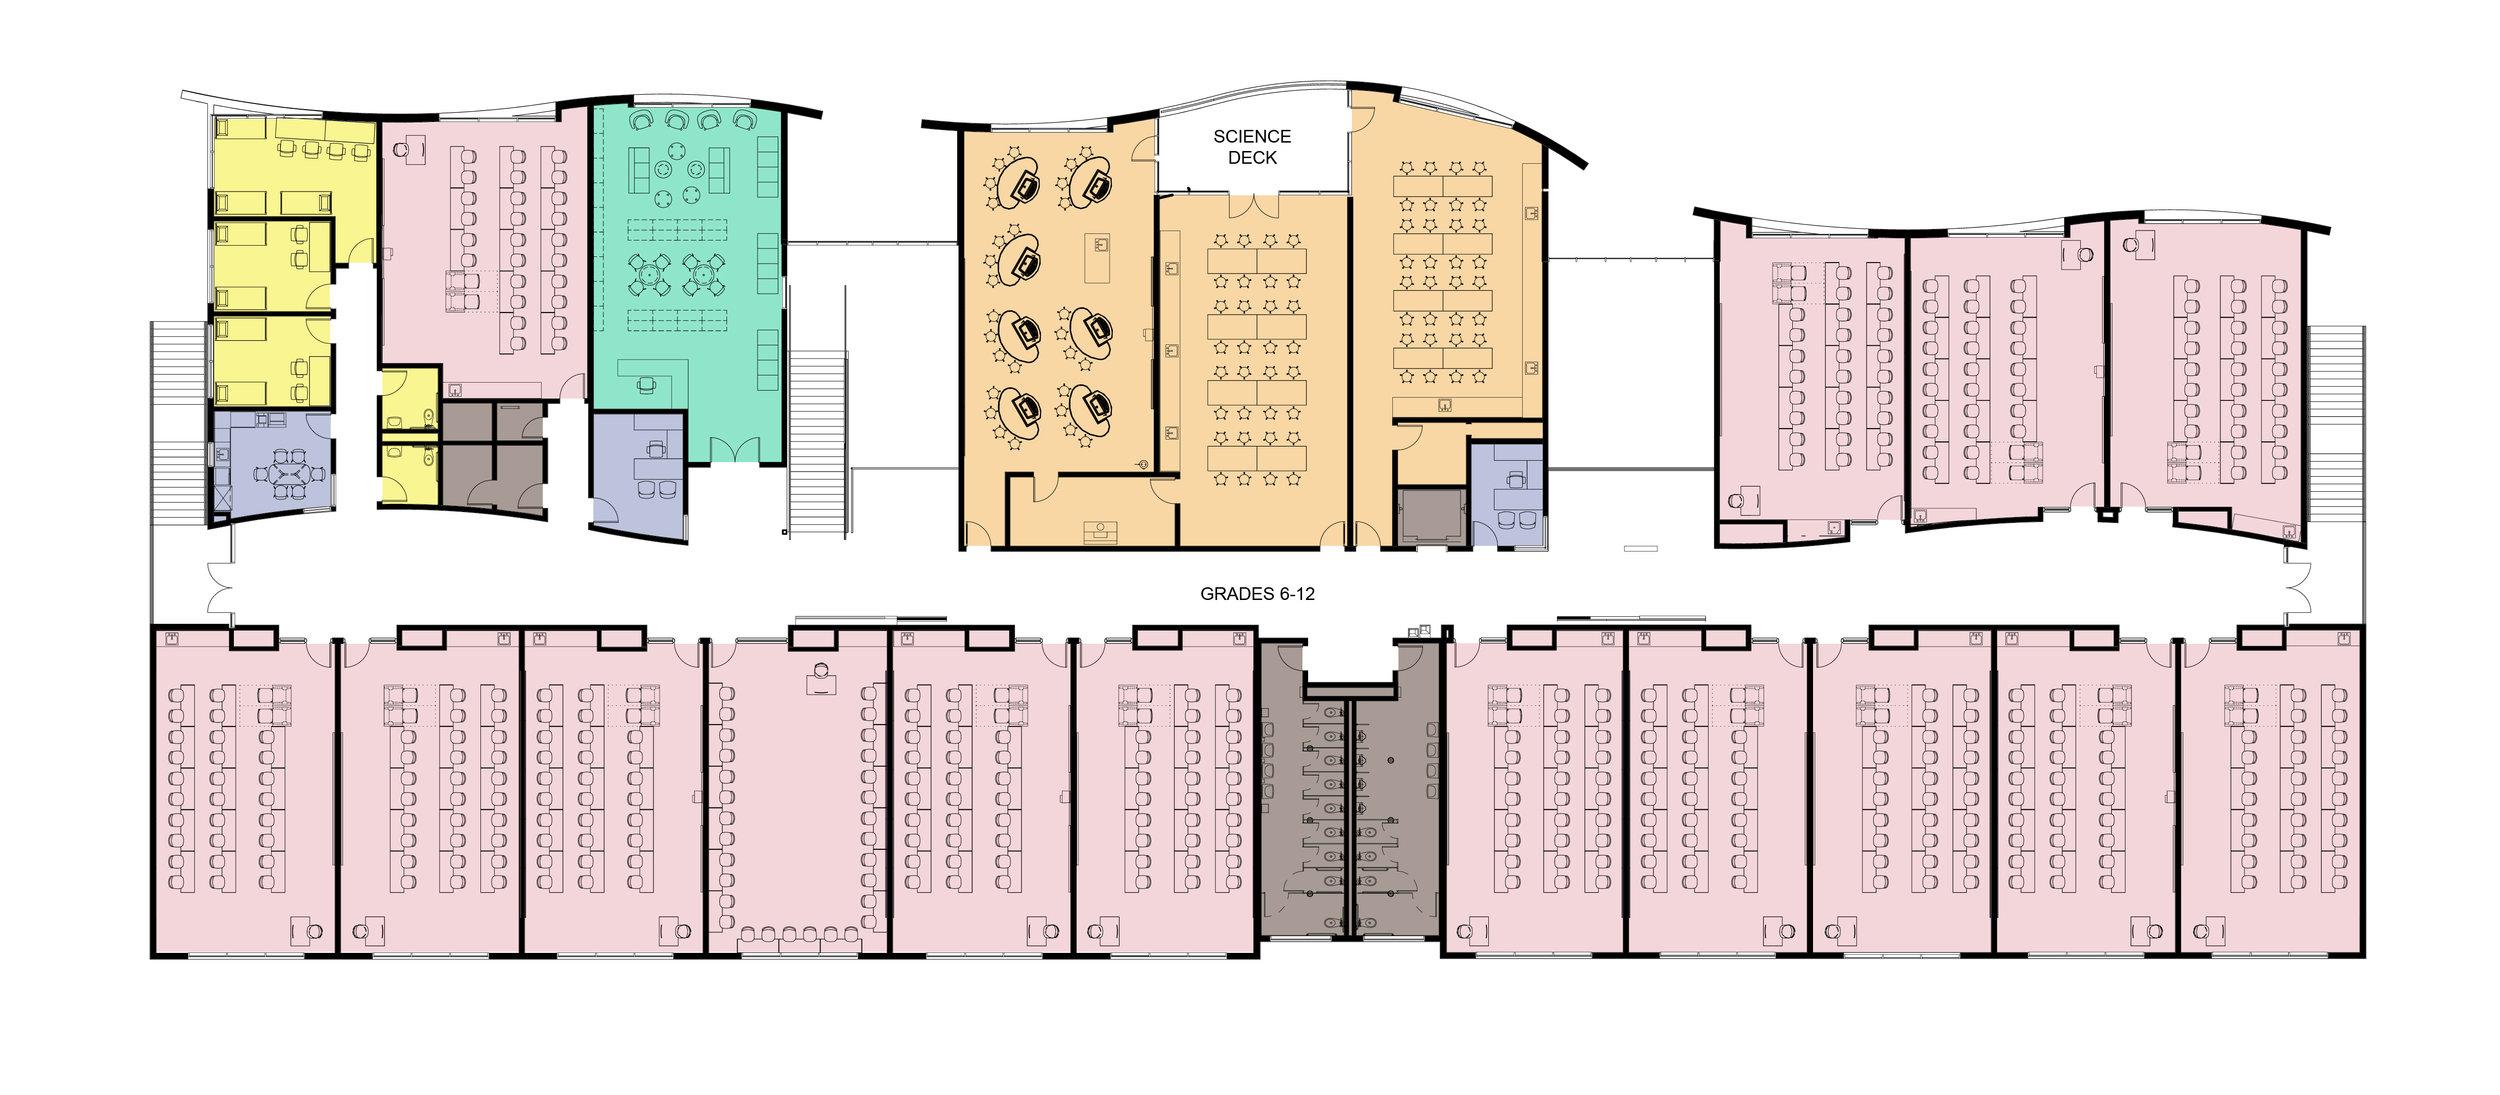 BA_EDU_Magnolia_Santa_Ana_site plan - SCALE_sm_web.jpg